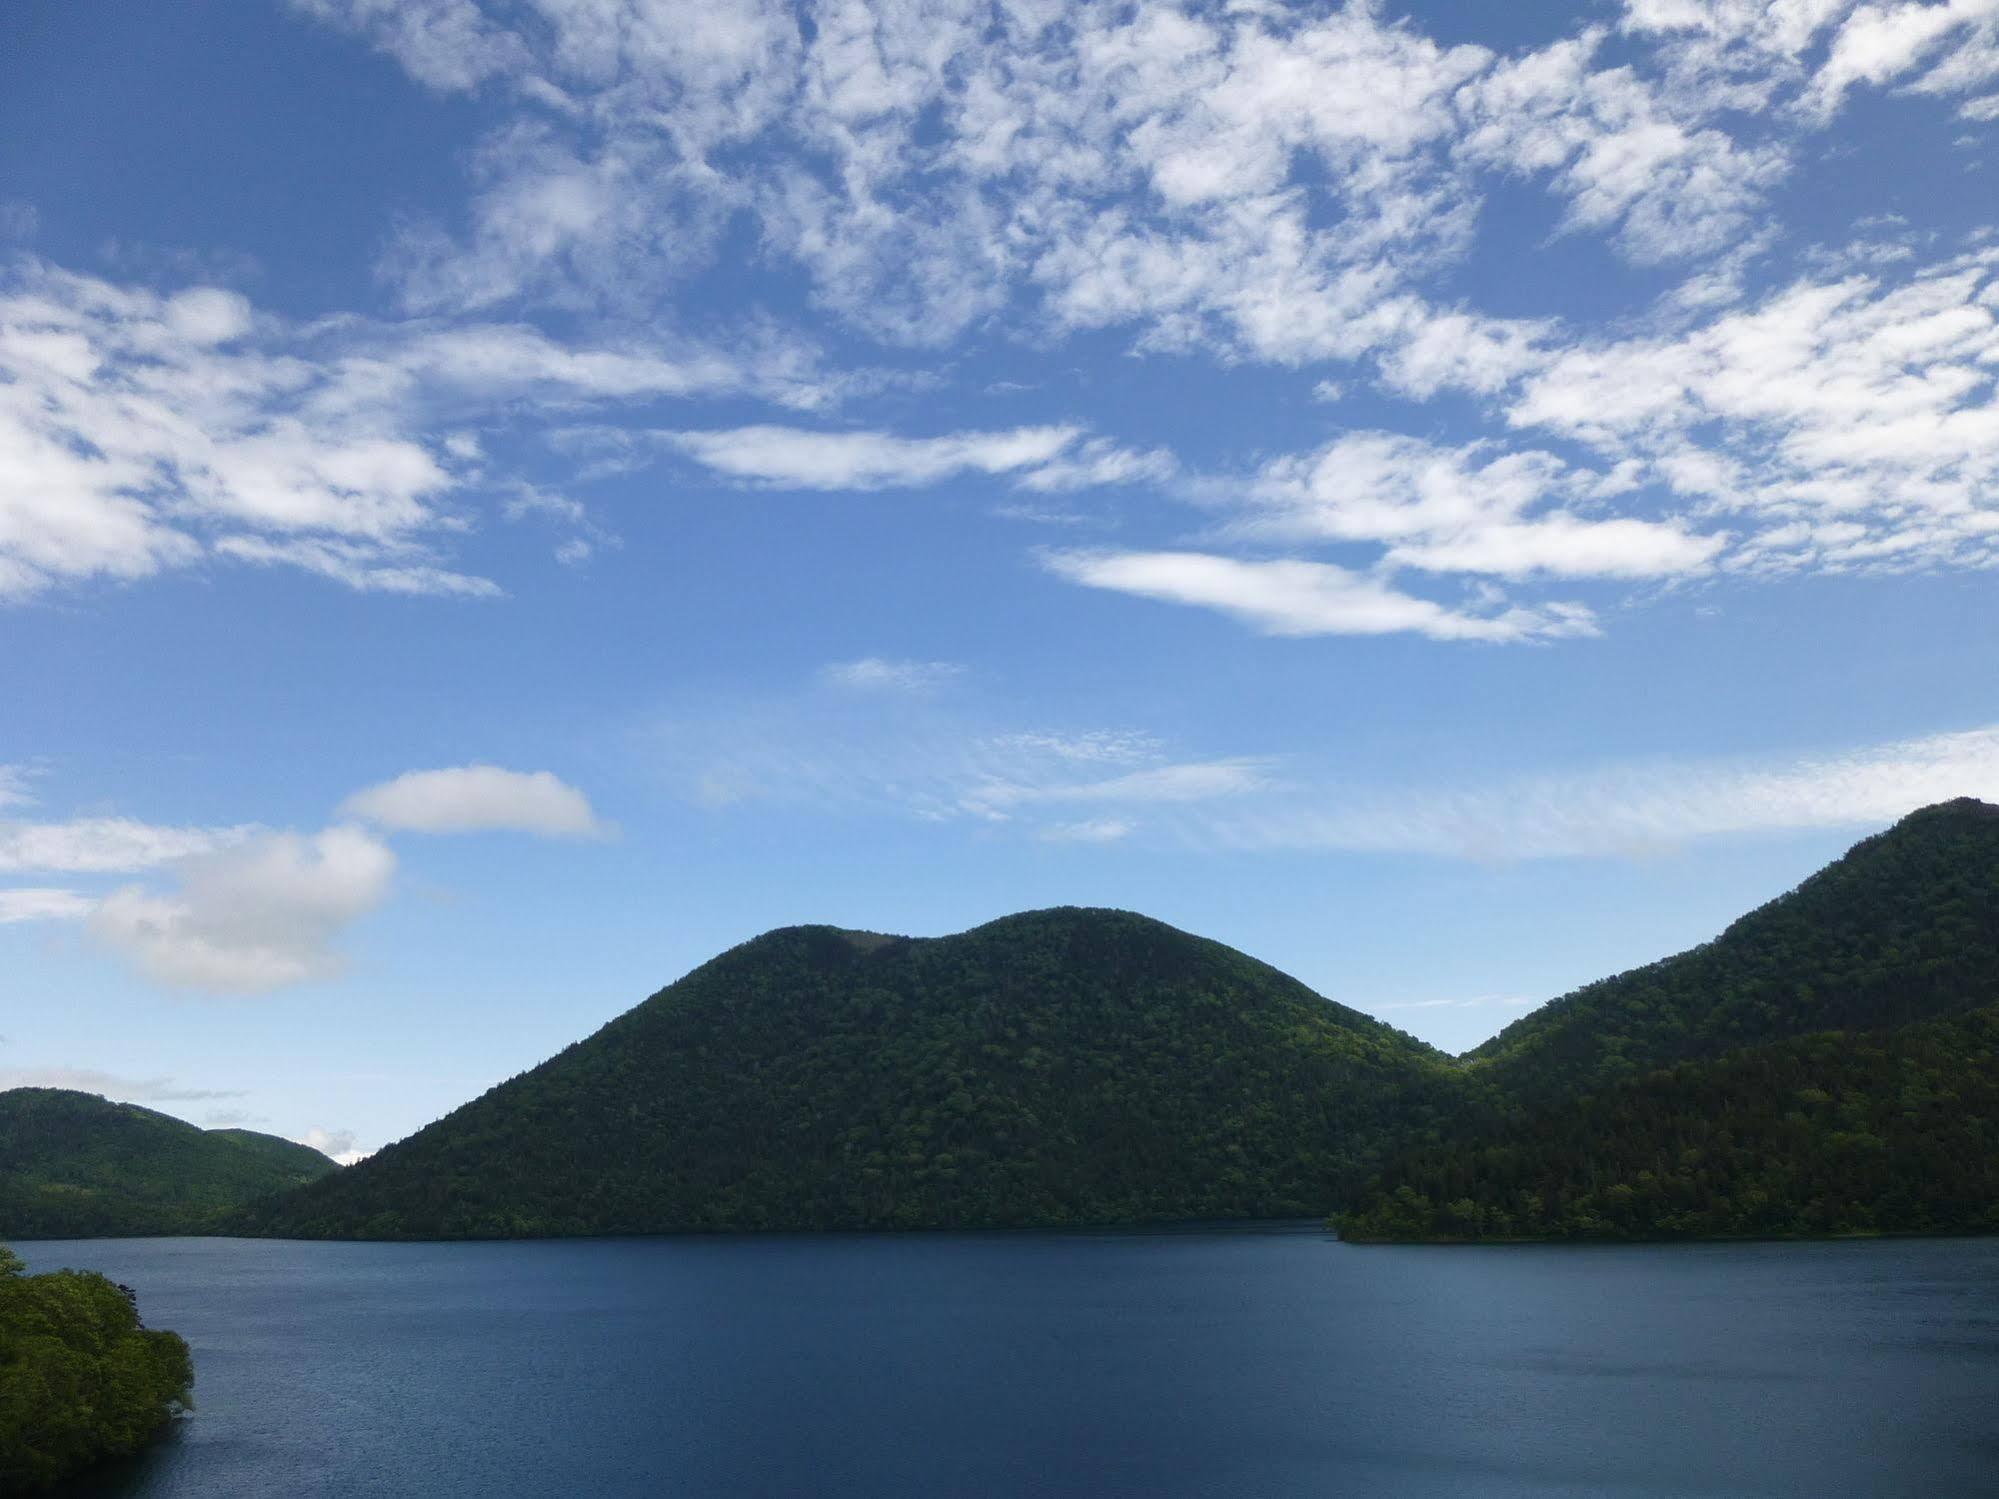 Shikaribetsu Lakeside Onsen Fusui